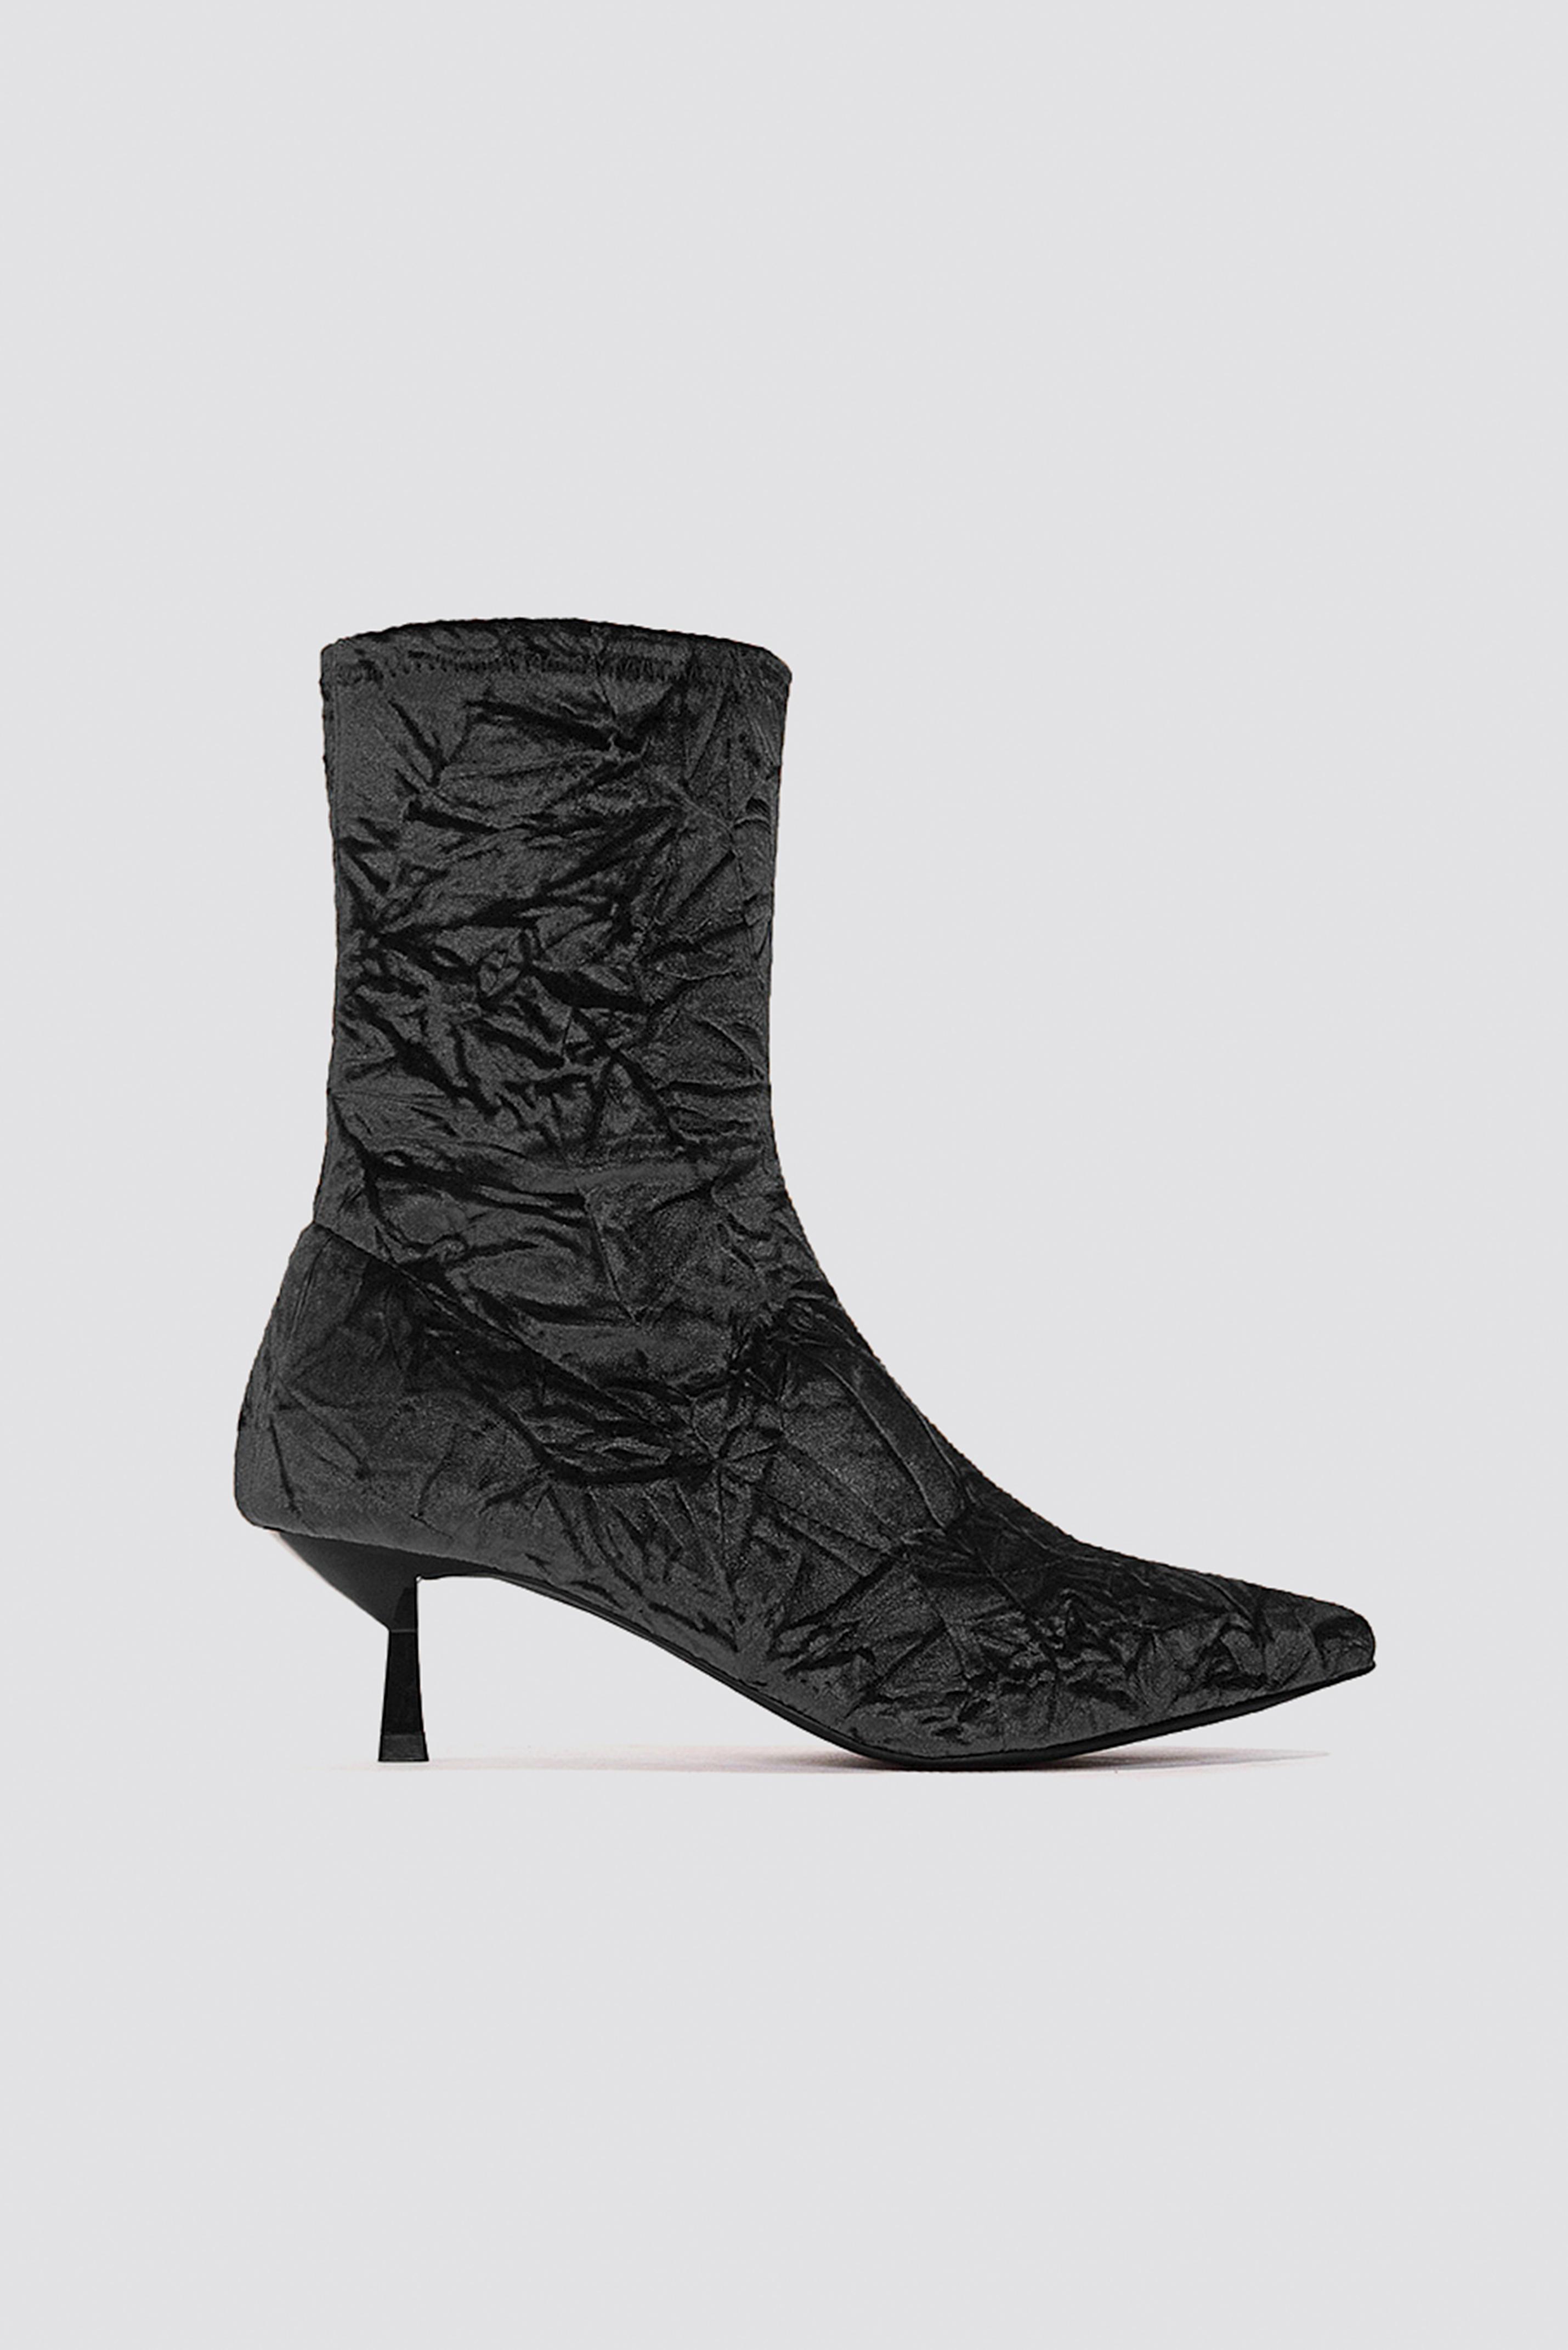 NA-KD Shoes Crushed Velvet Sock Boot - Black